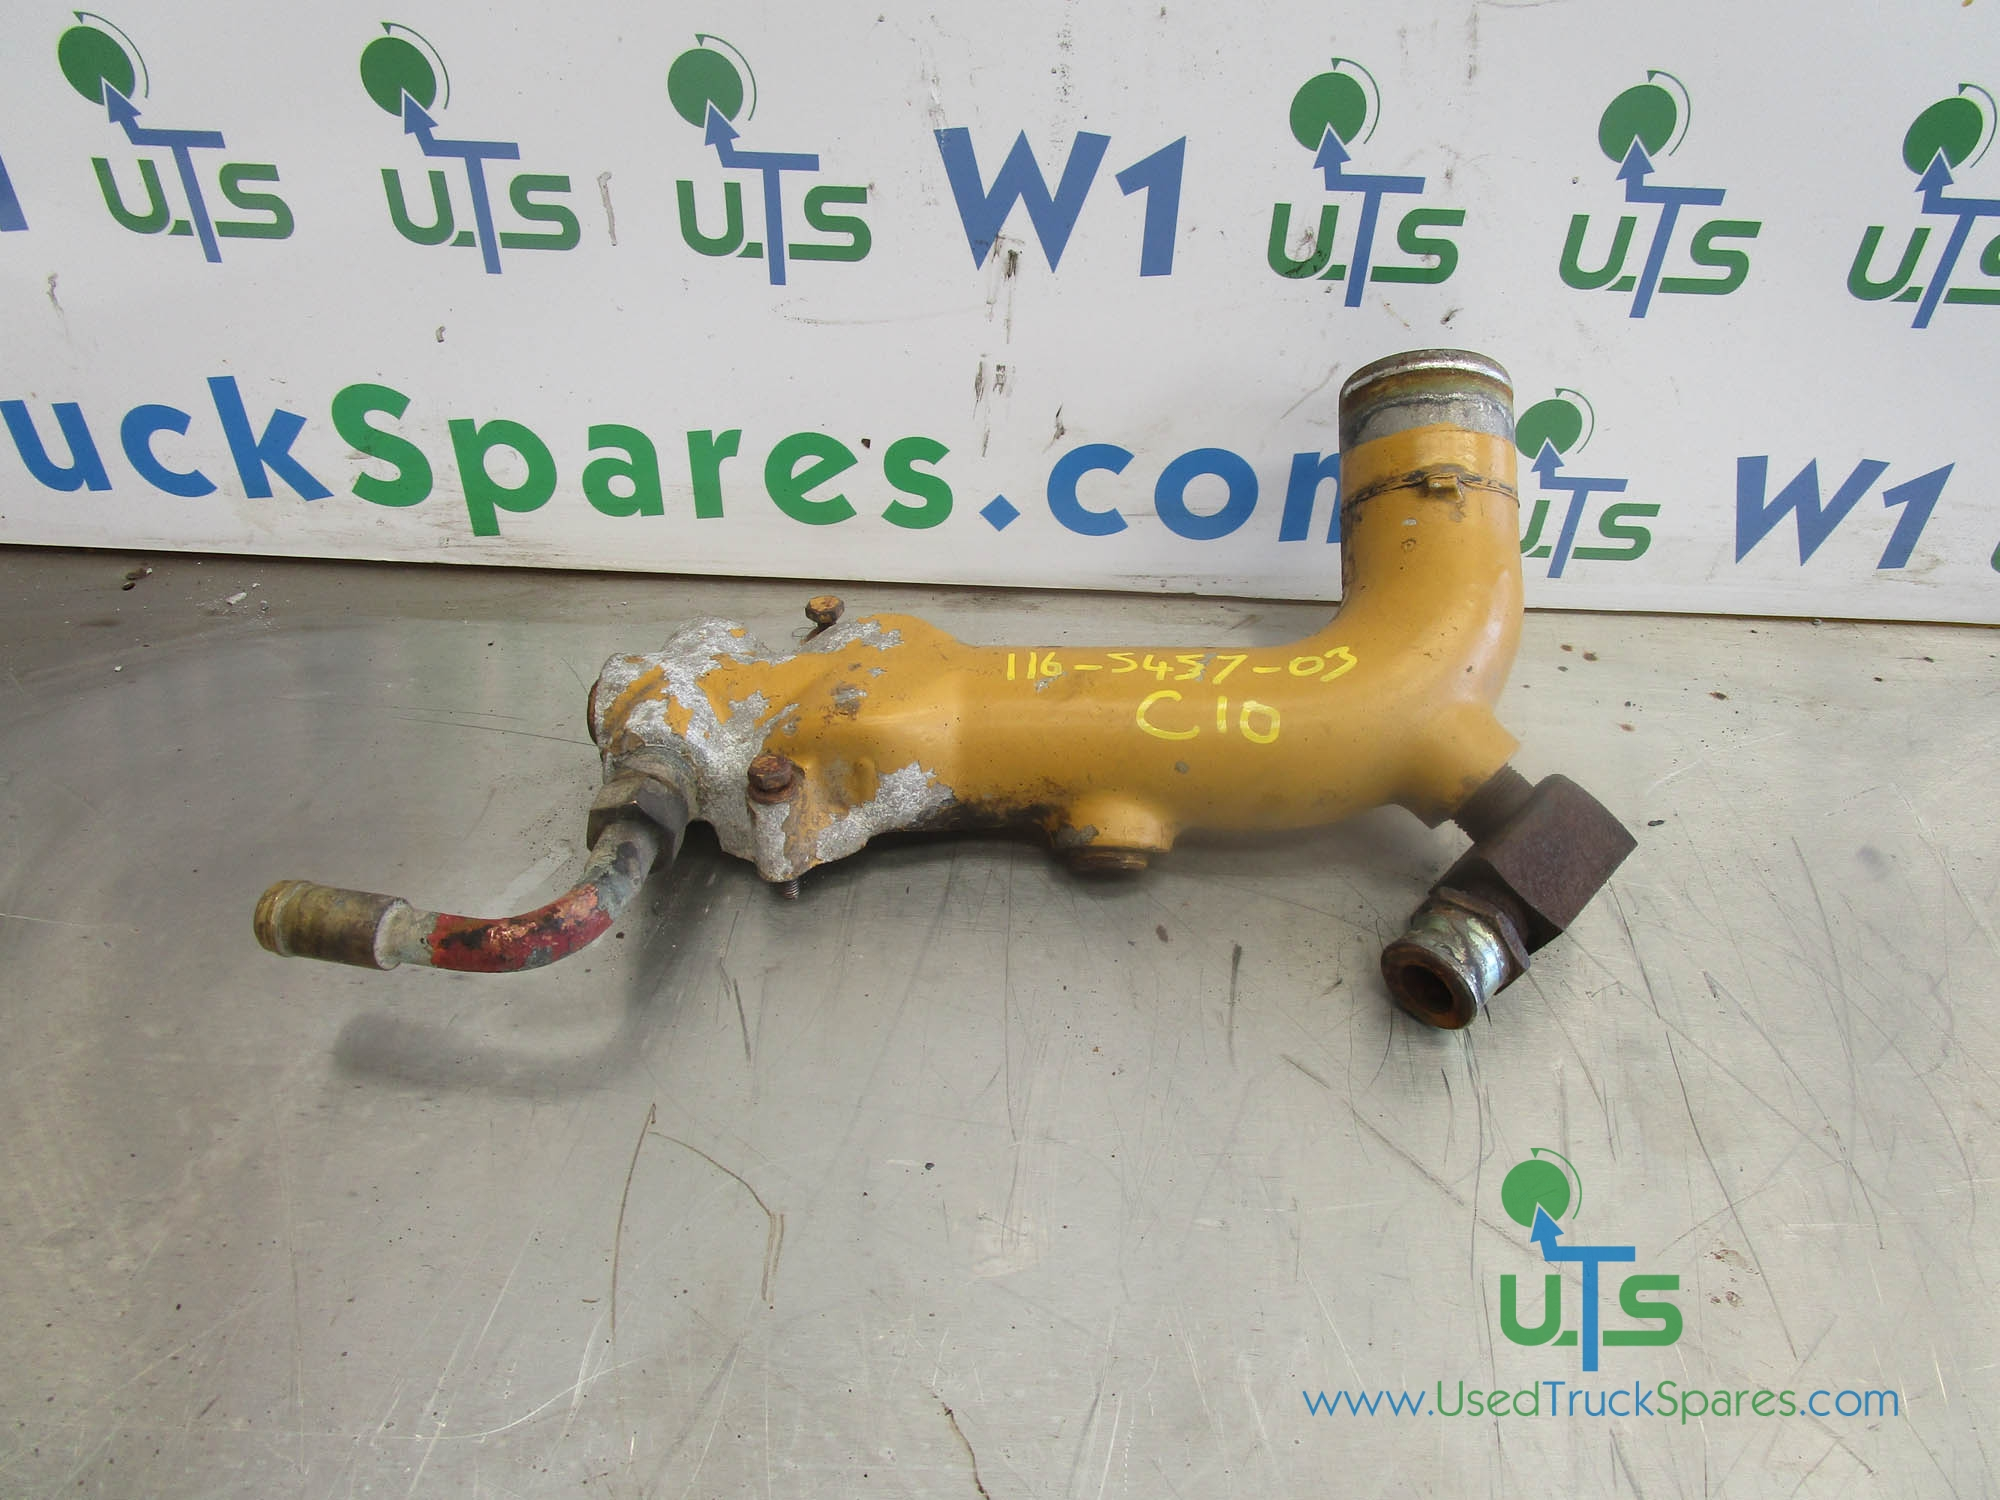 CAT C10 / C12 WATER PUMP PIPE P/NO 116-5457-03